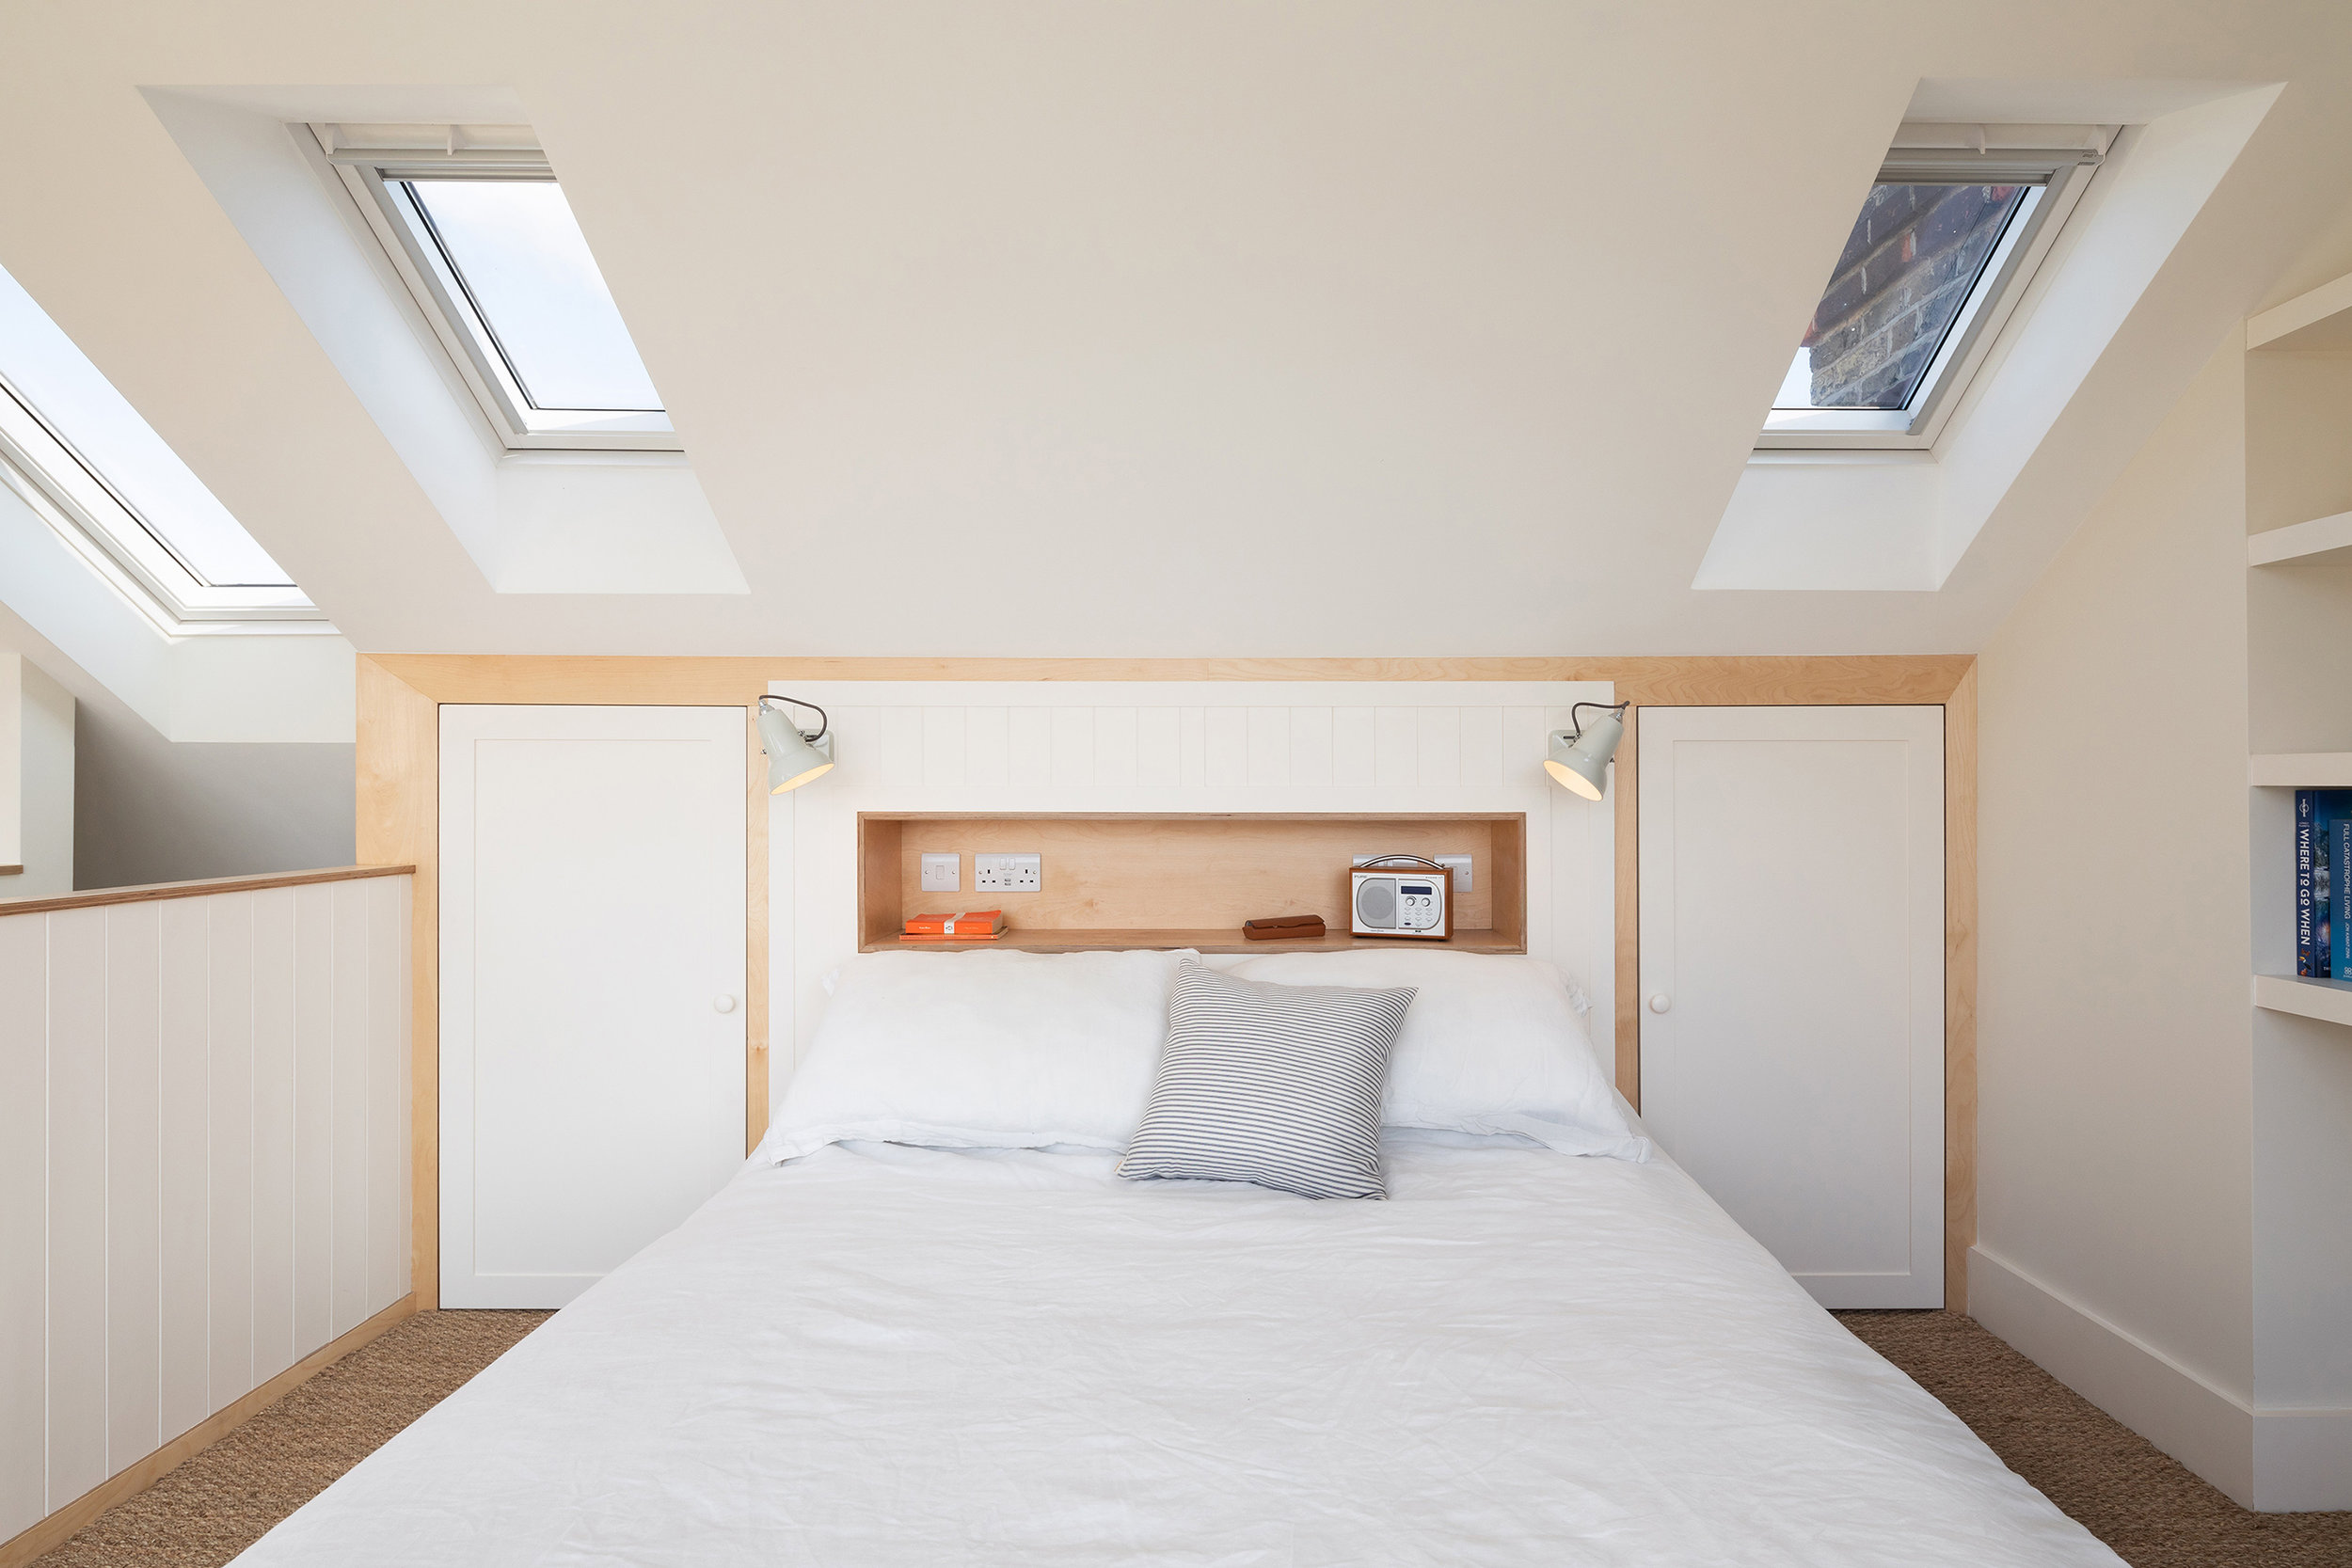 05-smeaton-road-victorian-house-roof-extension-loft-conversion-site-photo-architecture-wandsworth-south-london-uk-rider-stirland-architects-adam-scott.jpg